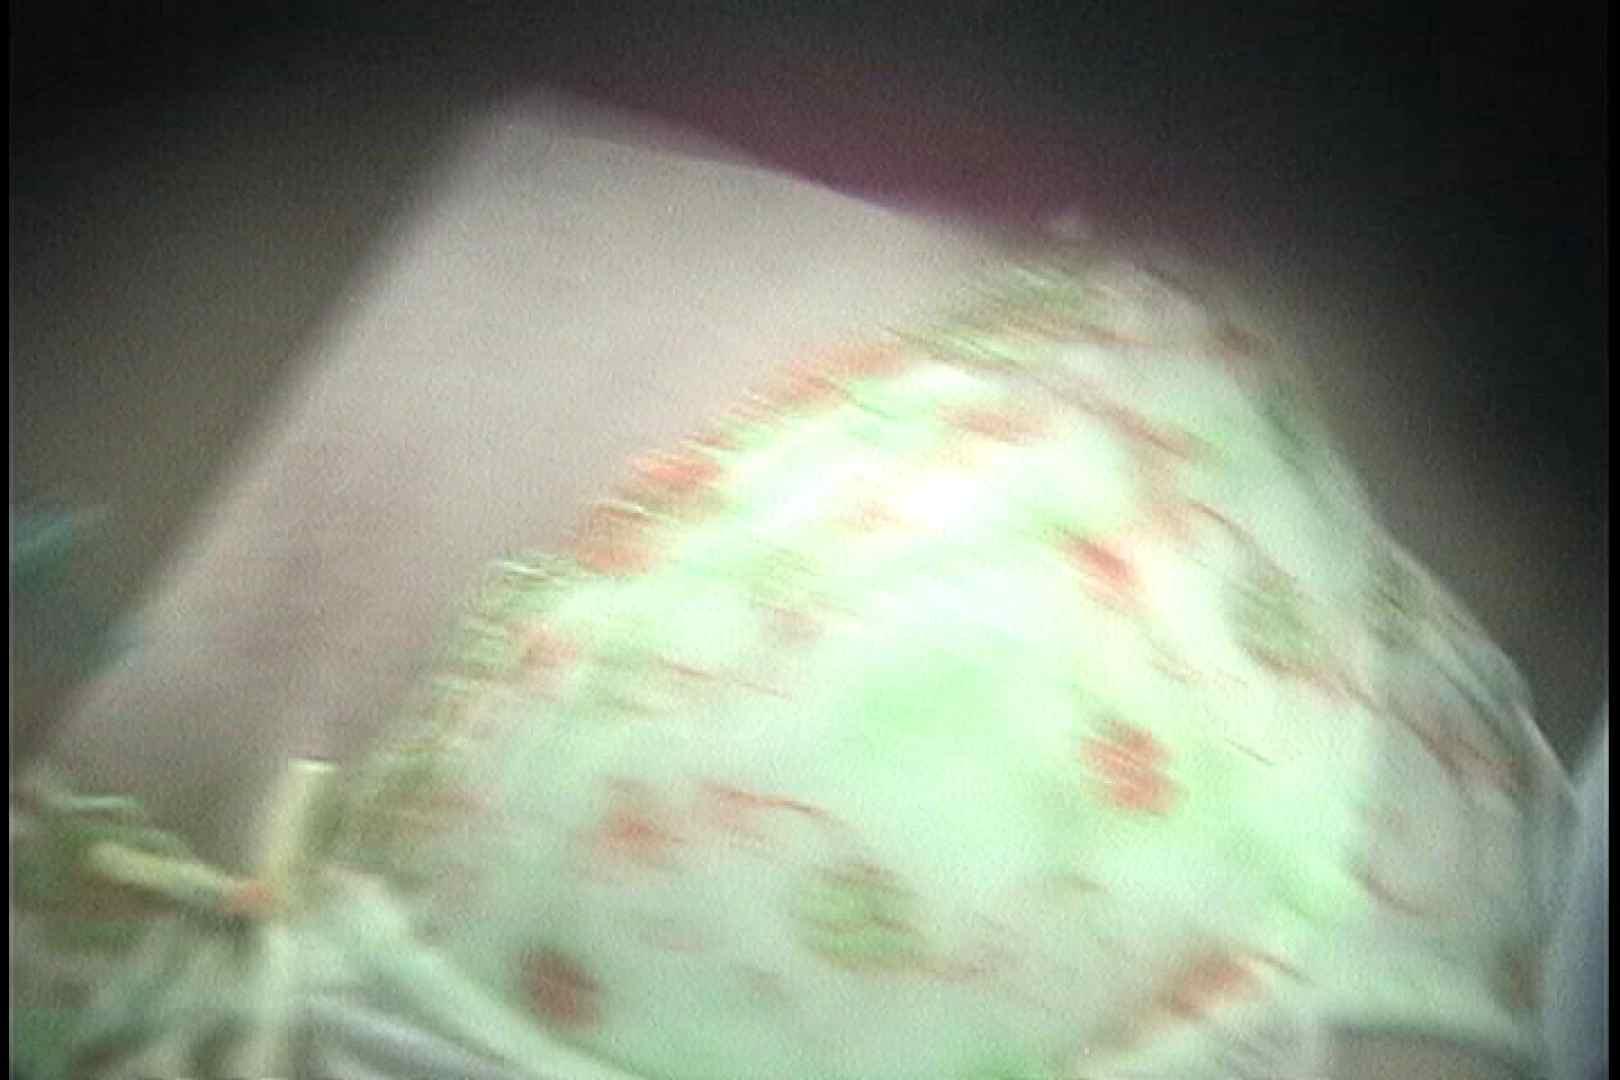 No.24 ビキニの割には陰毛は獰猛、ハミ毛が心配 接写  108画像 104